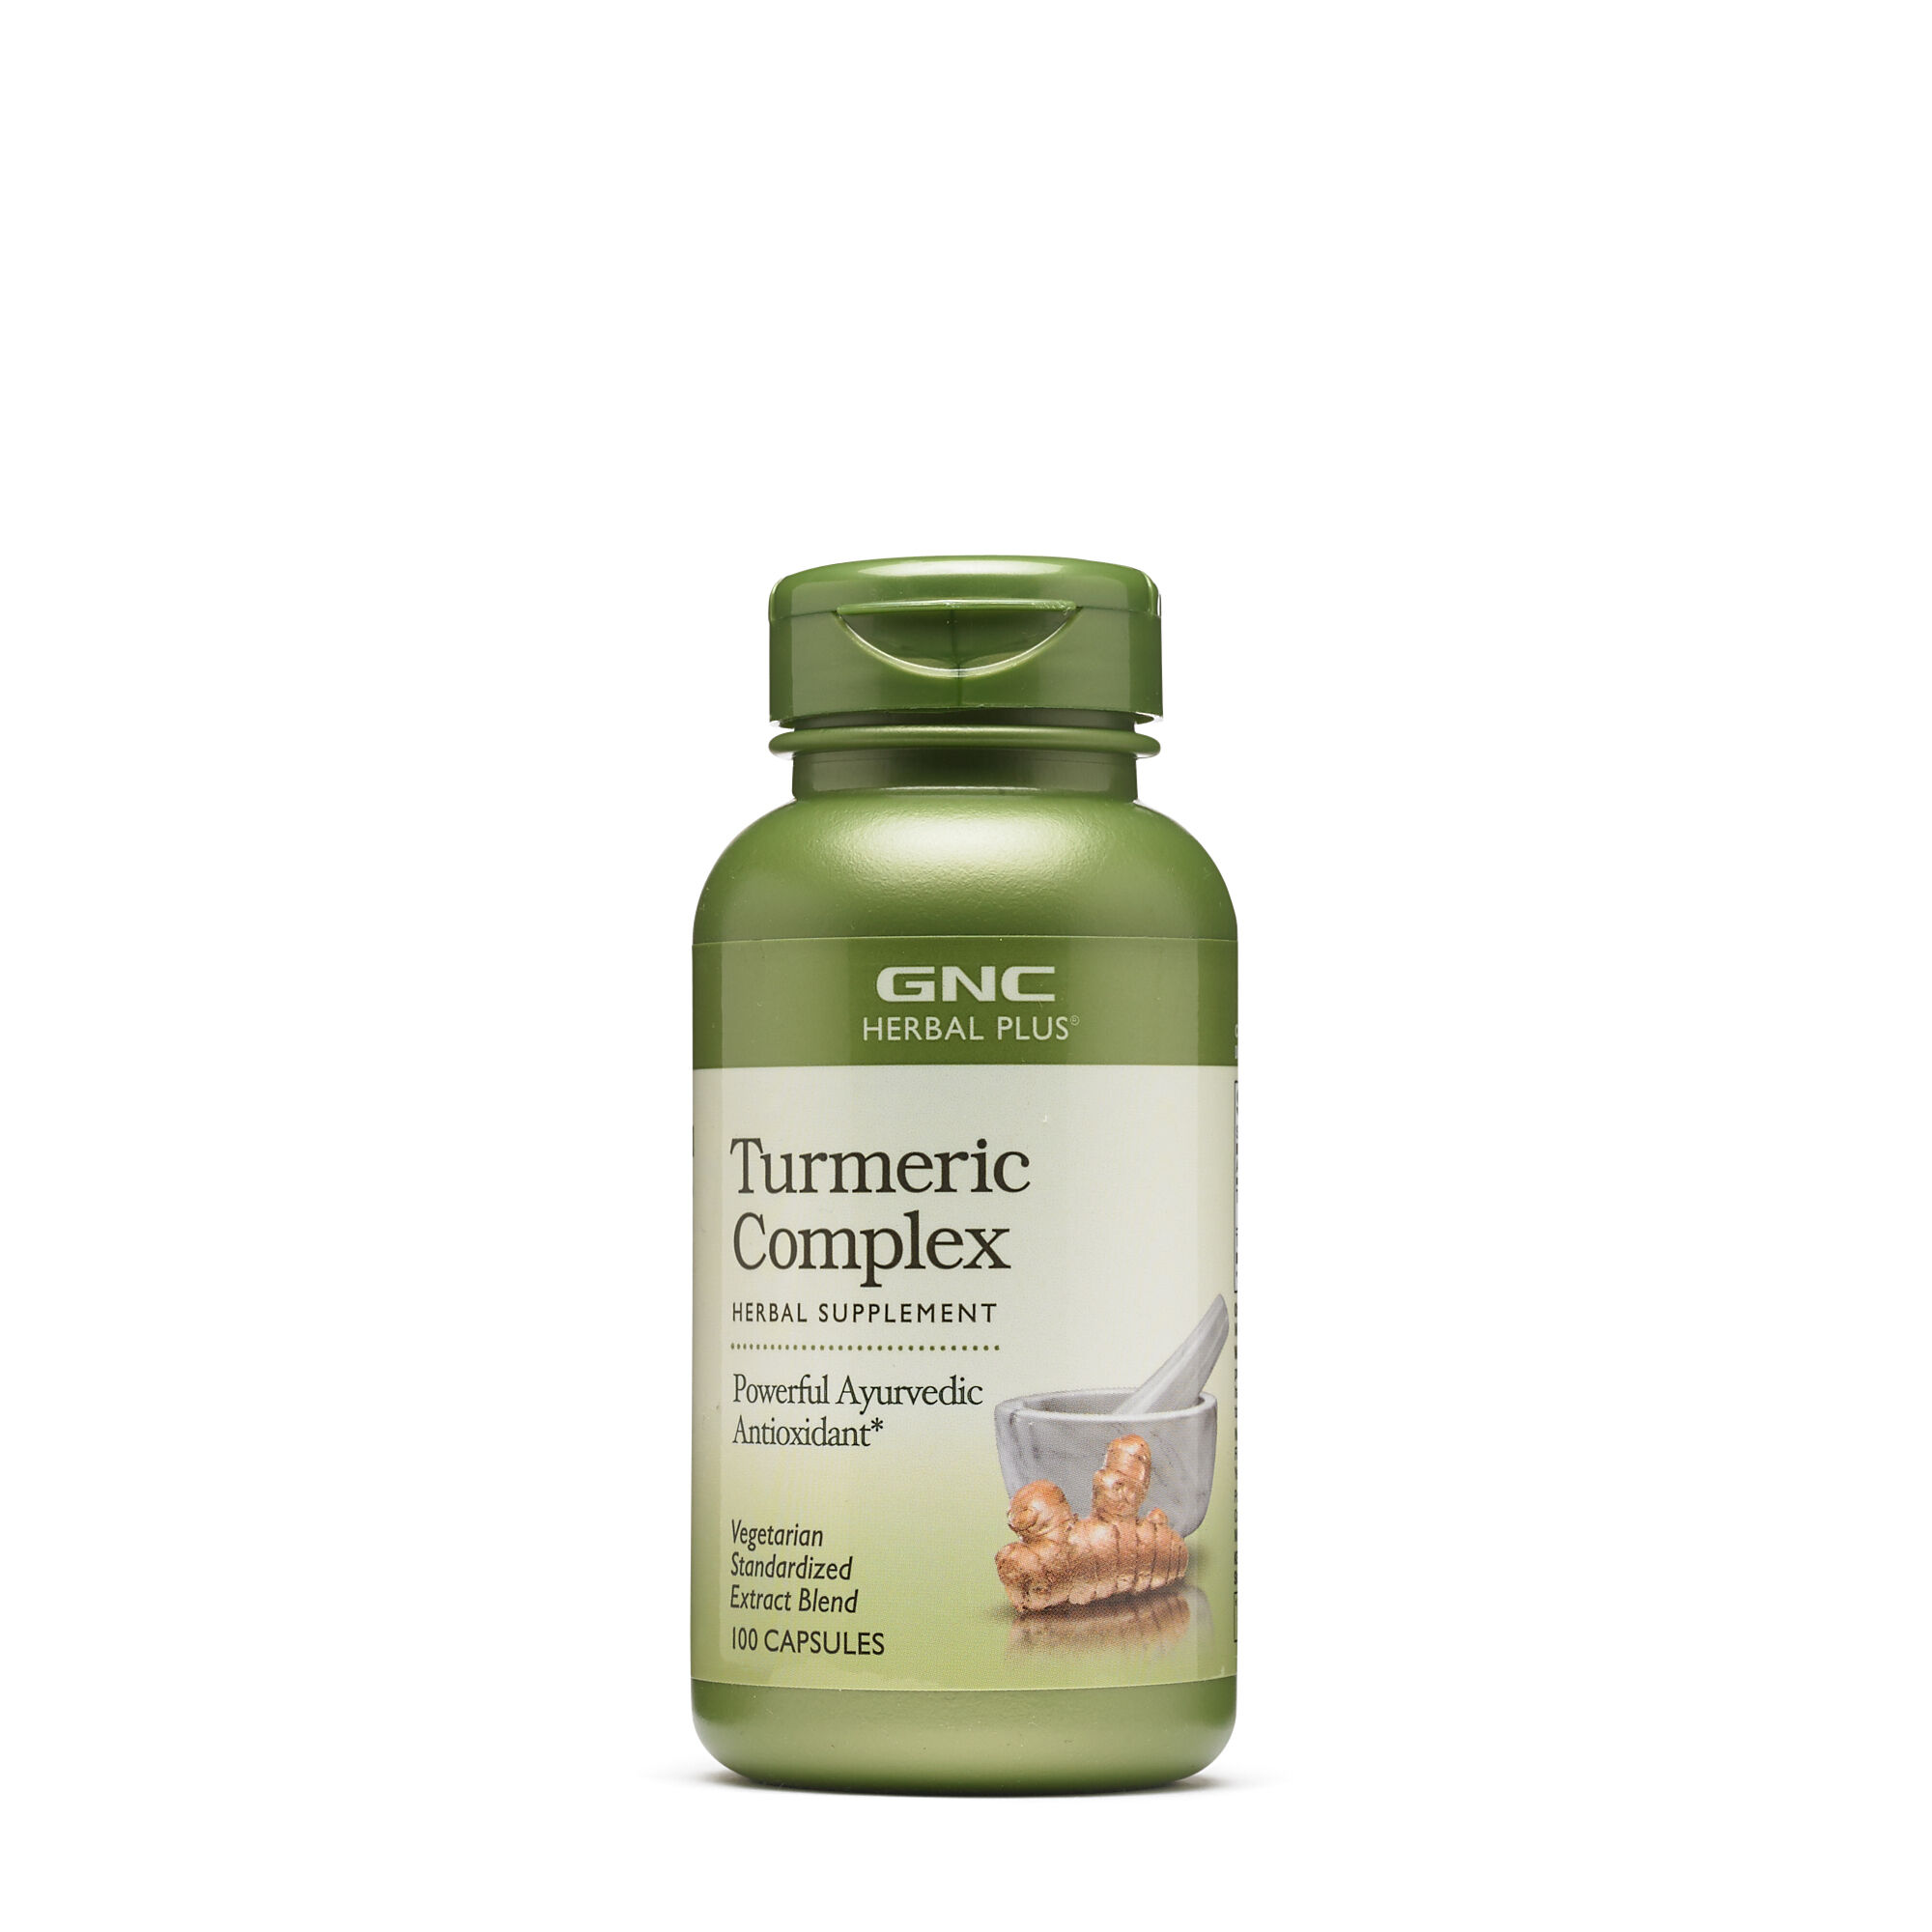 Turmeric Complex - 100 Capsules - GNC Herbal Plus - Joint Health